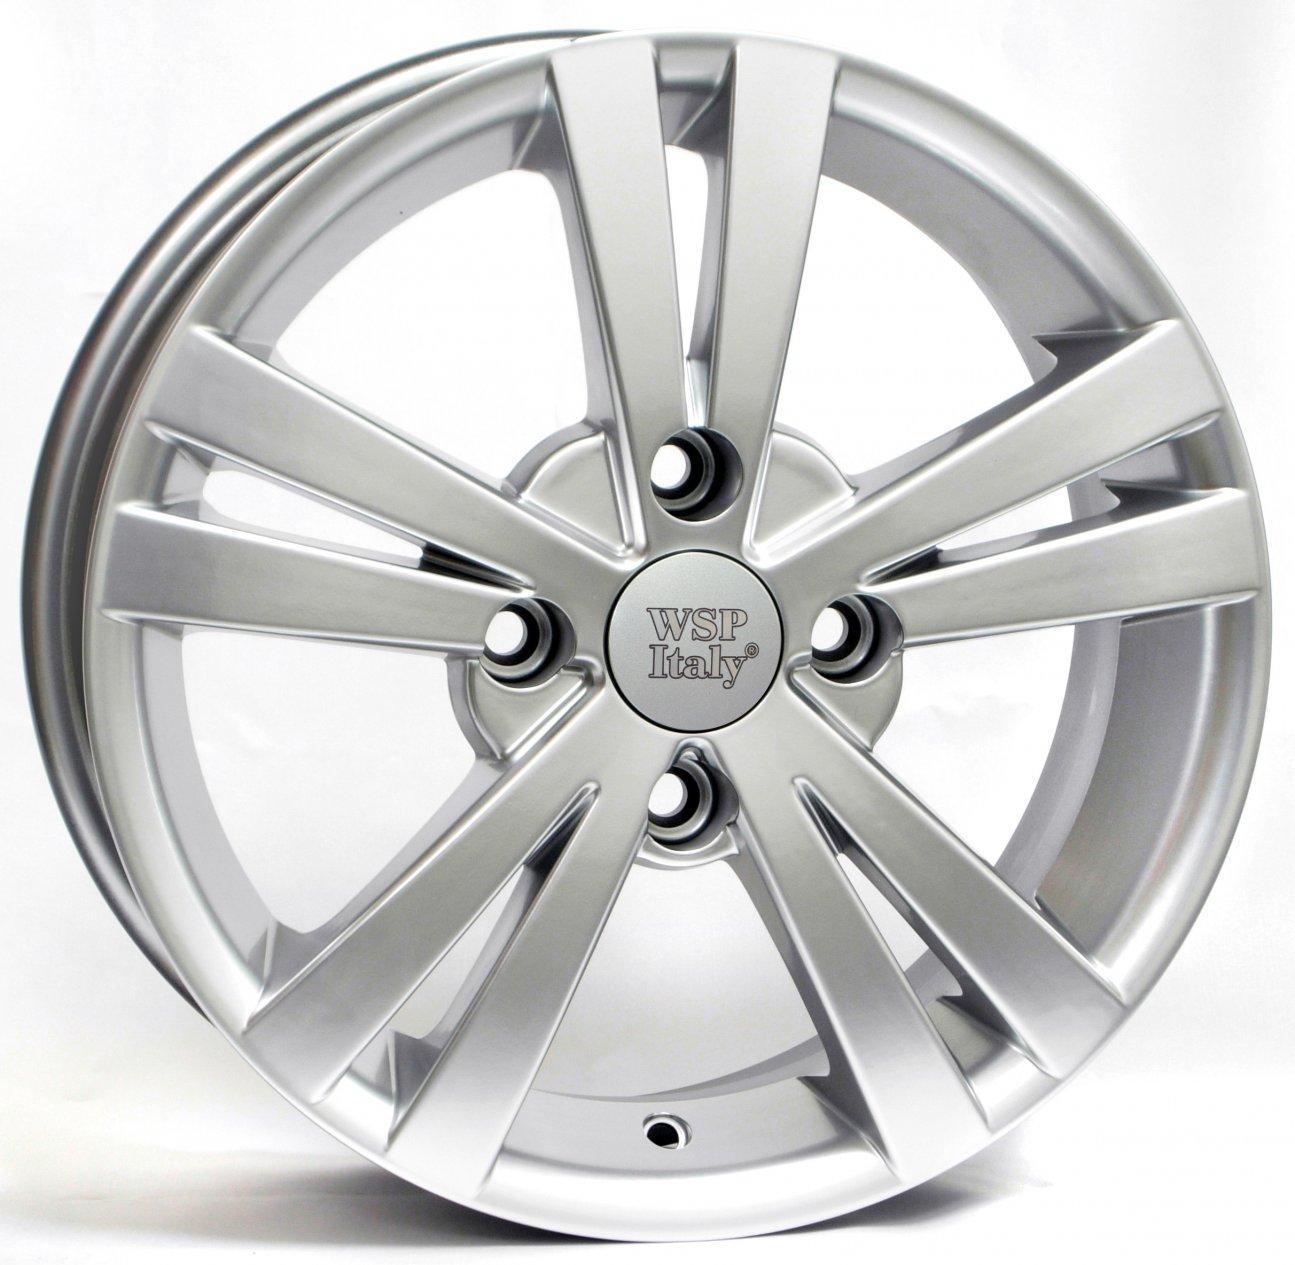 WSP Italy Chevrolet (W3602) Tristano 6x15 5x114,3 ET44 DIA56,6 (silver)